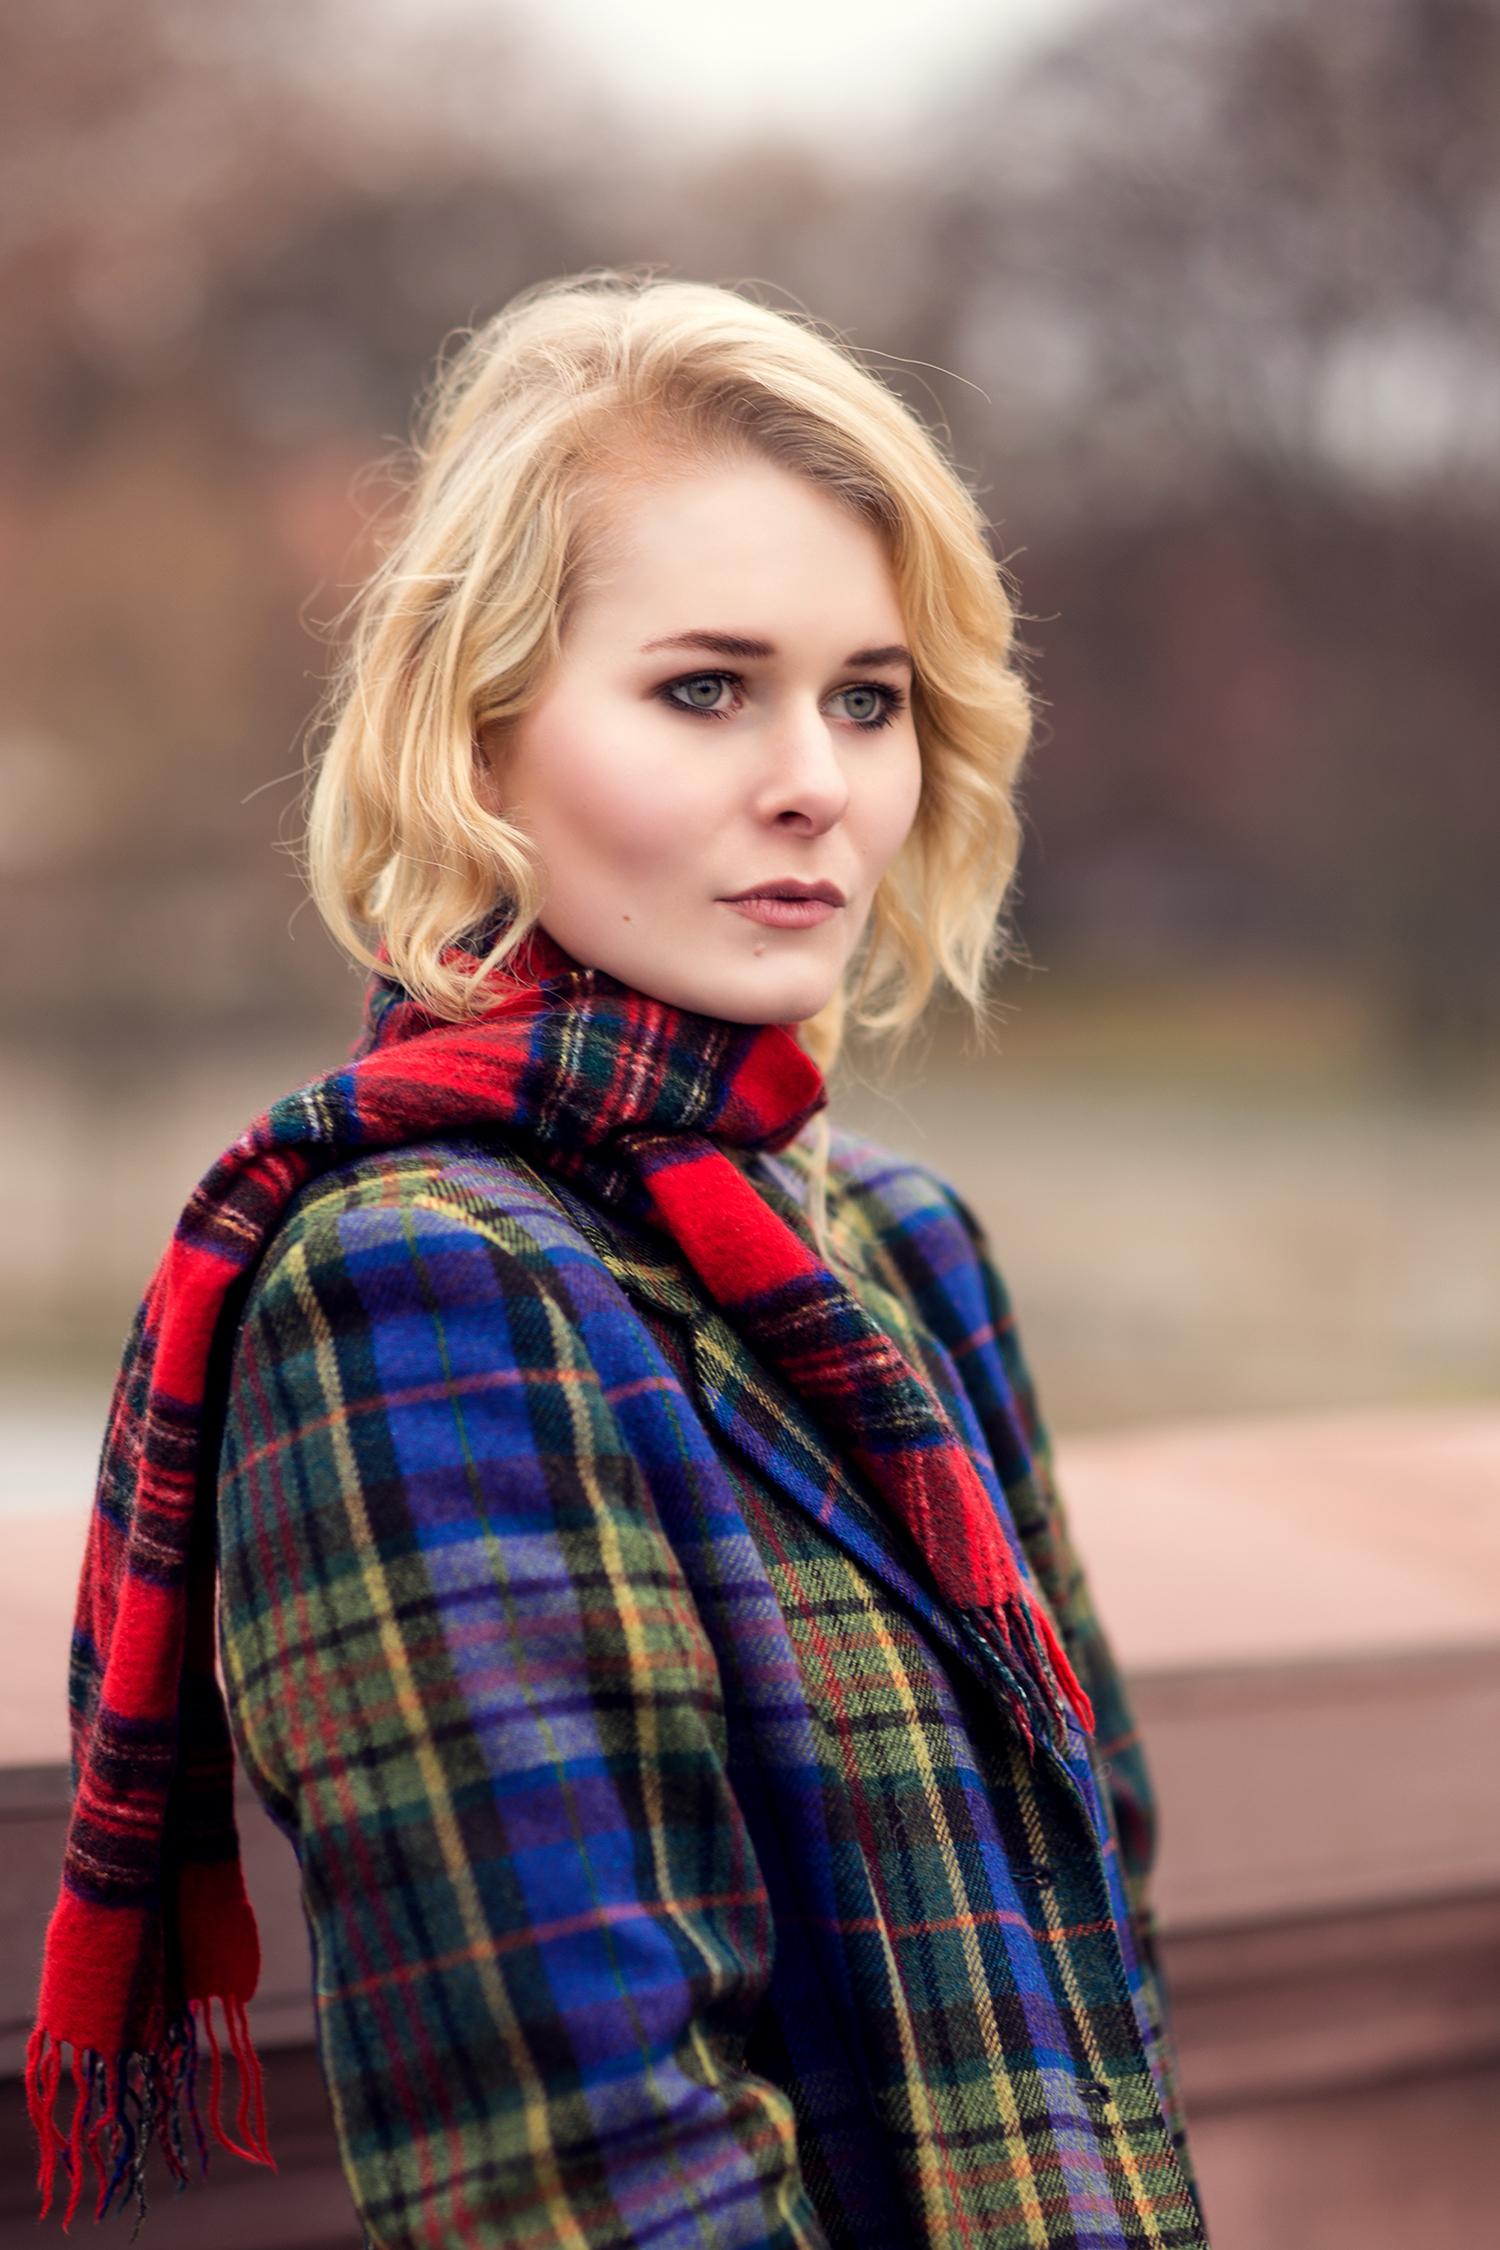 fashionbloggerin-christina-key-aus-berlin-s